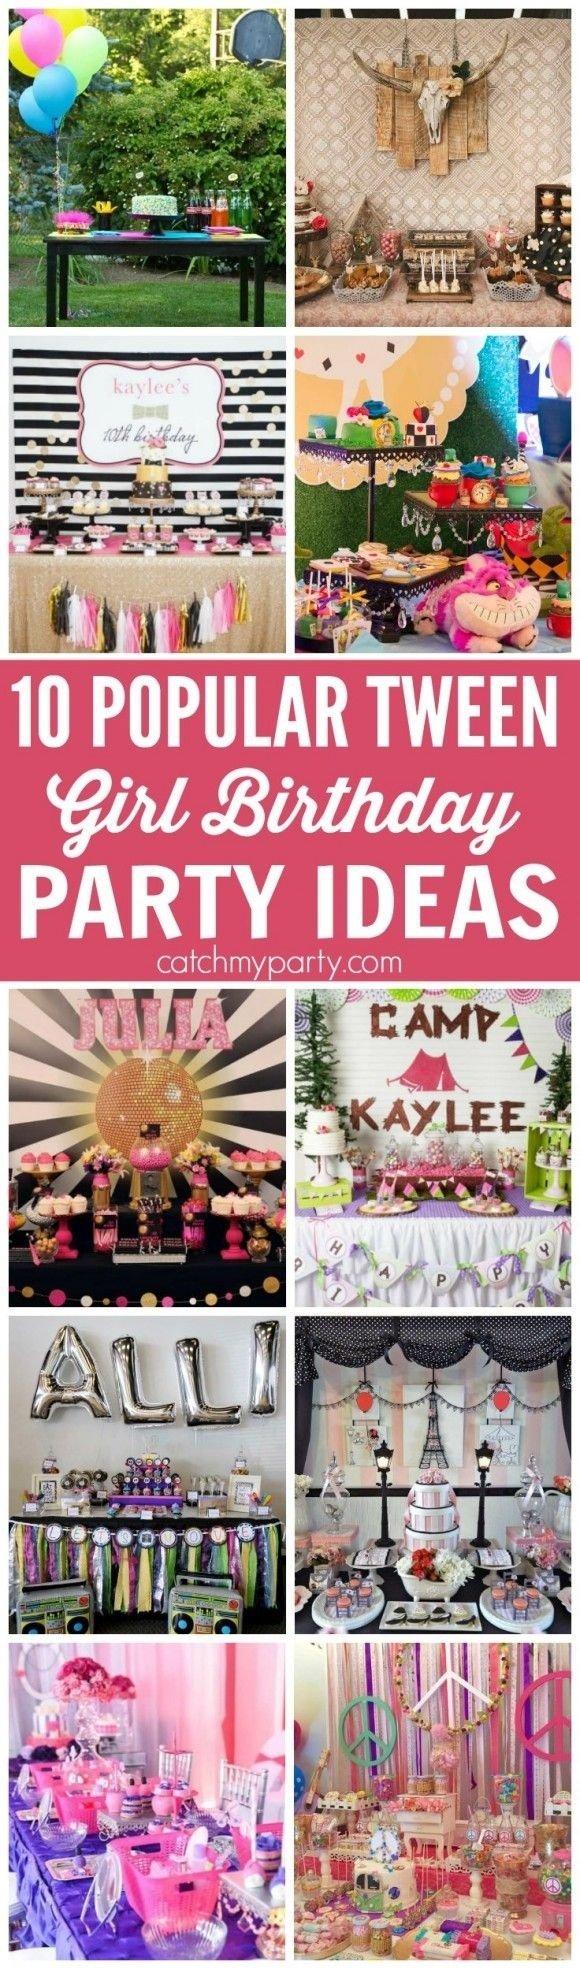 10 Spectacular 13 Year Old Teenage Girl Birthday Party Ideas 416 best girl birthday party ideas images on pinterest birthday 11